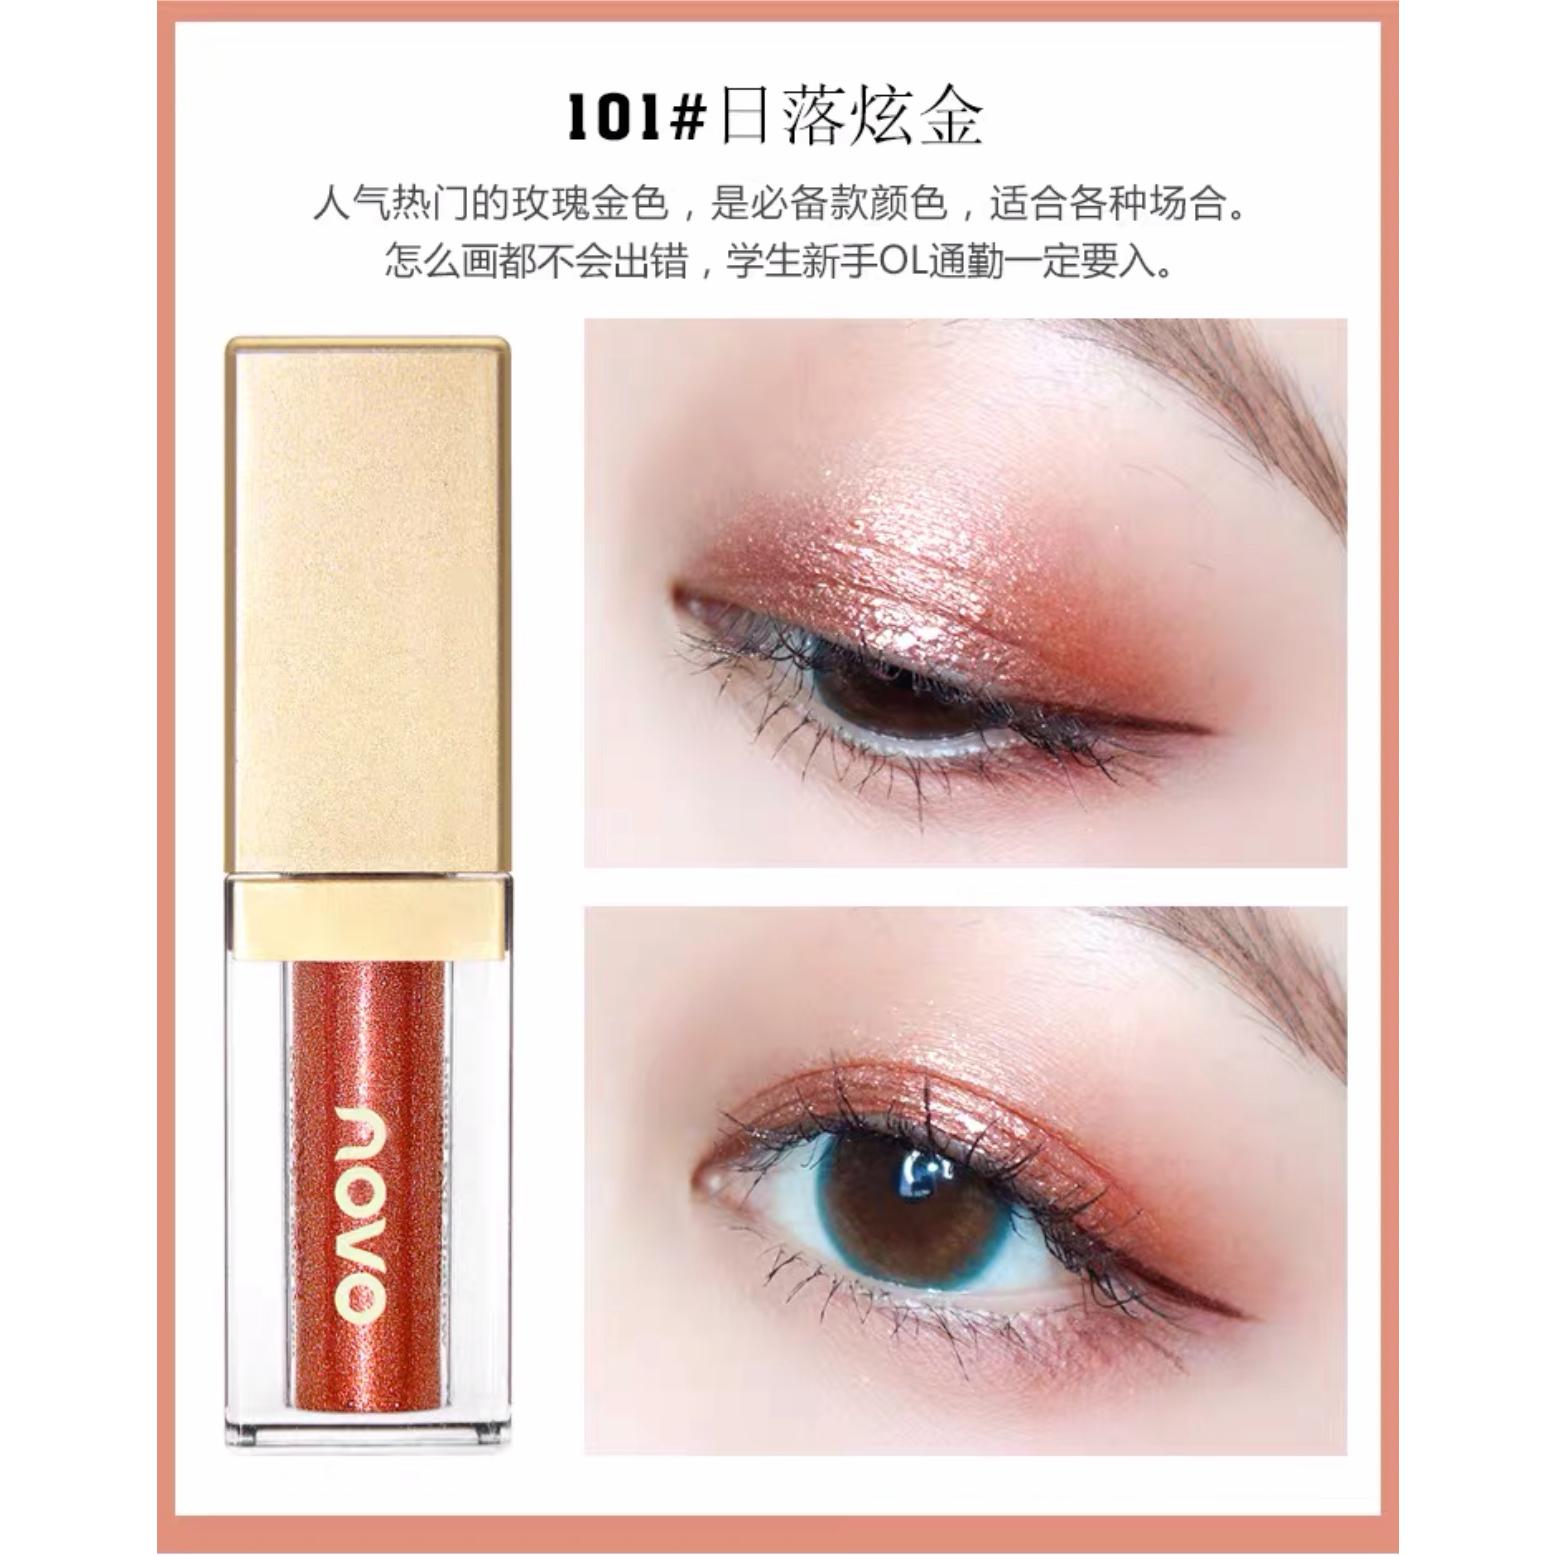 NOVO Glitter Liquid Eyeshadow Starlight Makeup Gel Eye Shadow Make Up - NOMORSATU thumbnail